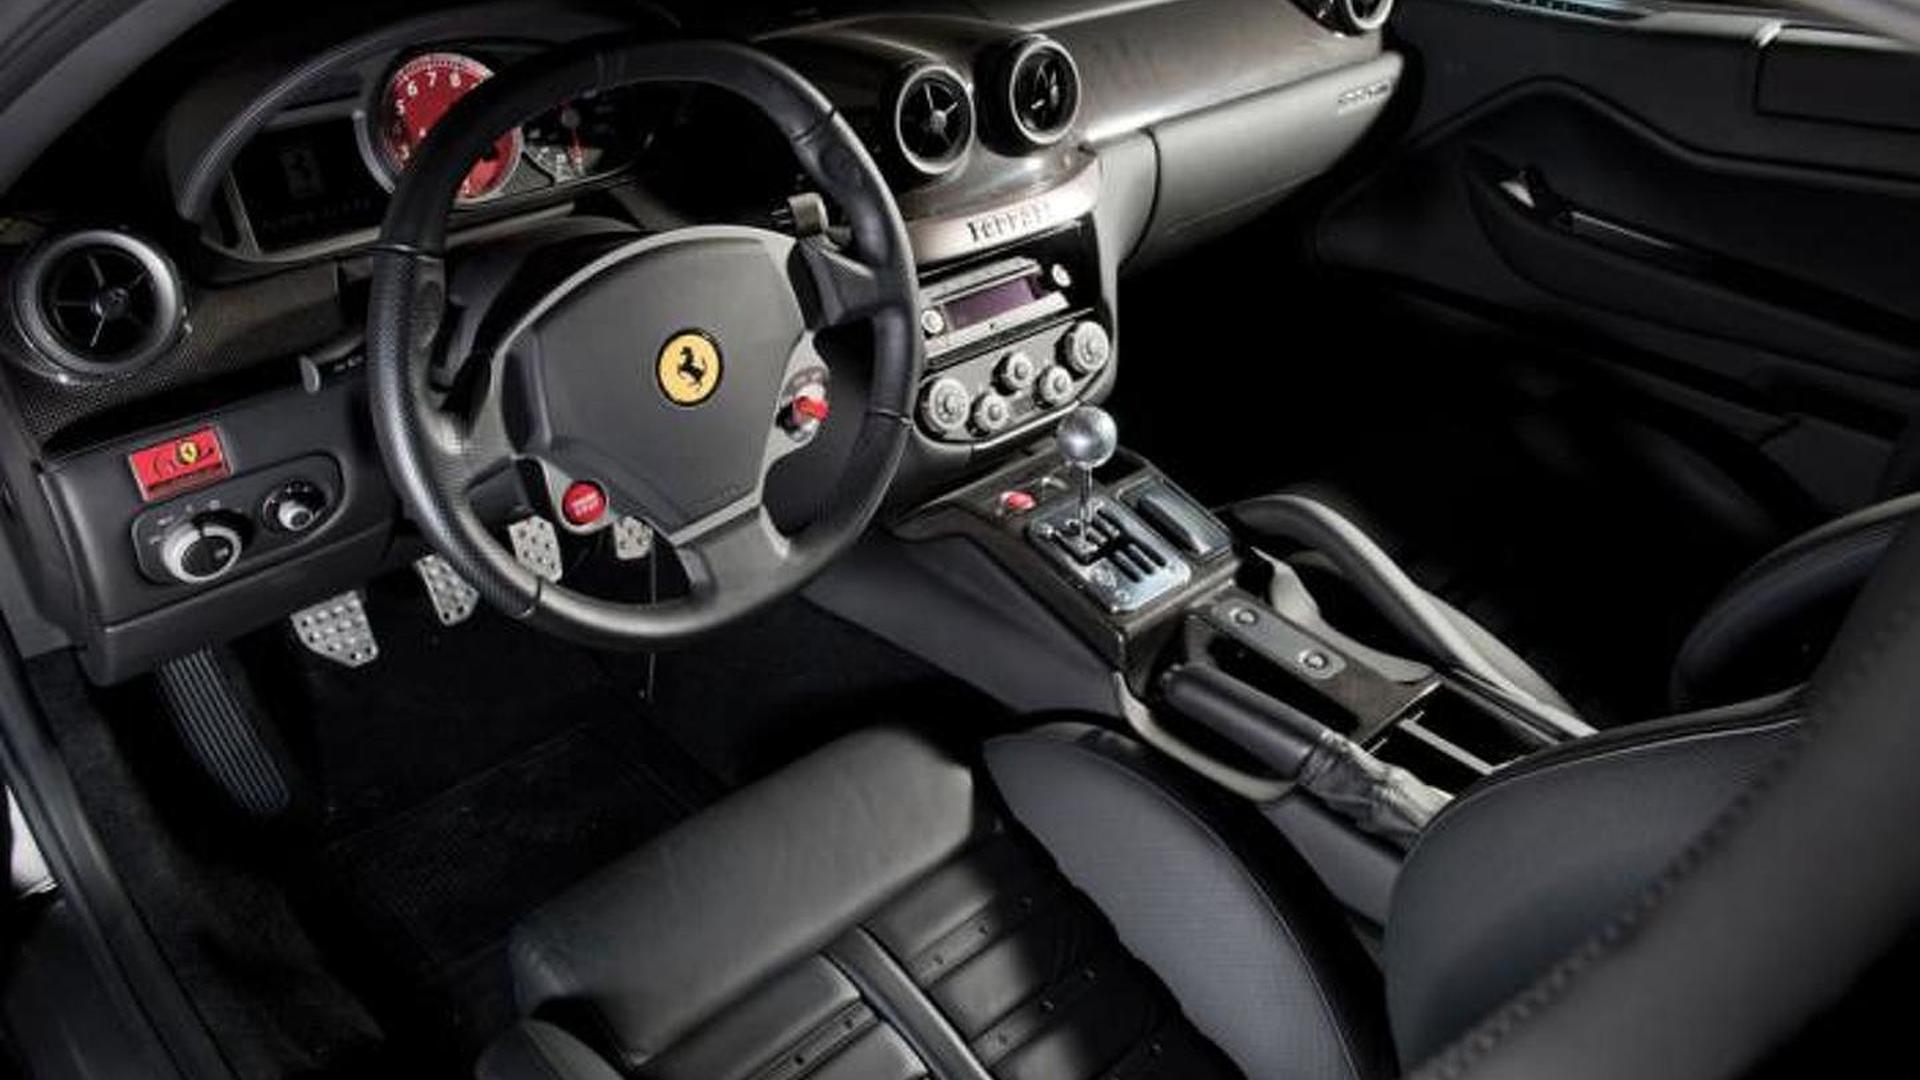 2007 ferrari 599 gtb with manual gearbox auctioned for 682 000 rh motor1 com Ferrari 599 GTB Fiorano Interior ferrari 599 manual gearbox for sale